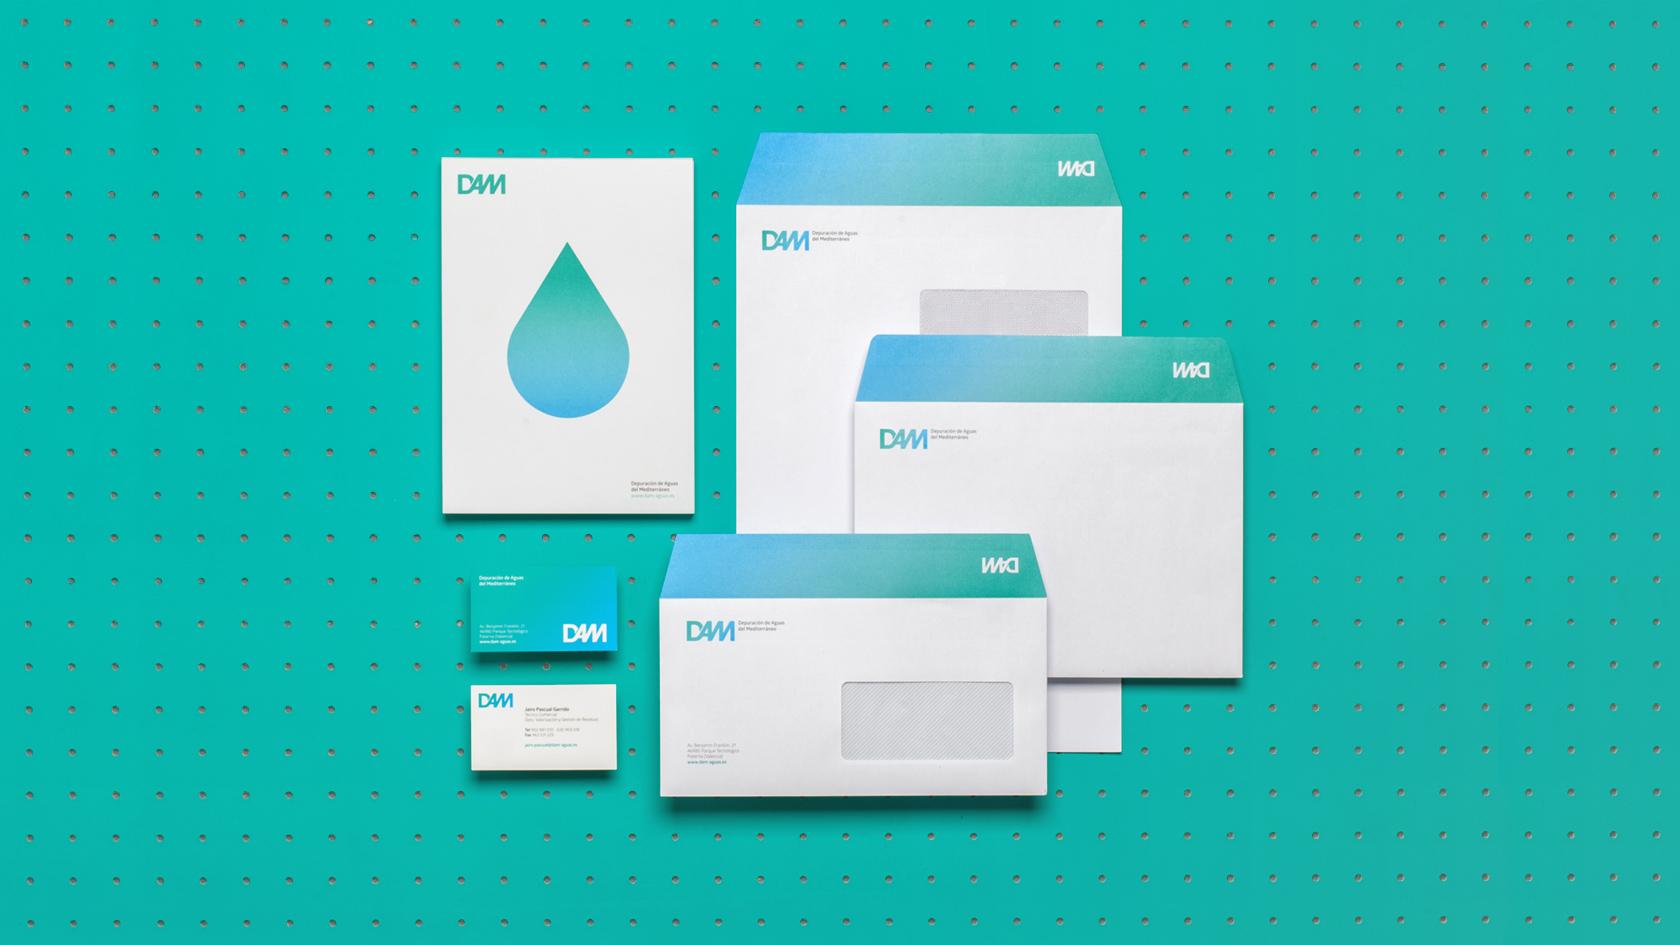 pixelarte-diseno-grafico-papeleria-stationery-Dam_Depuracion_Aguas_Mediterraneo